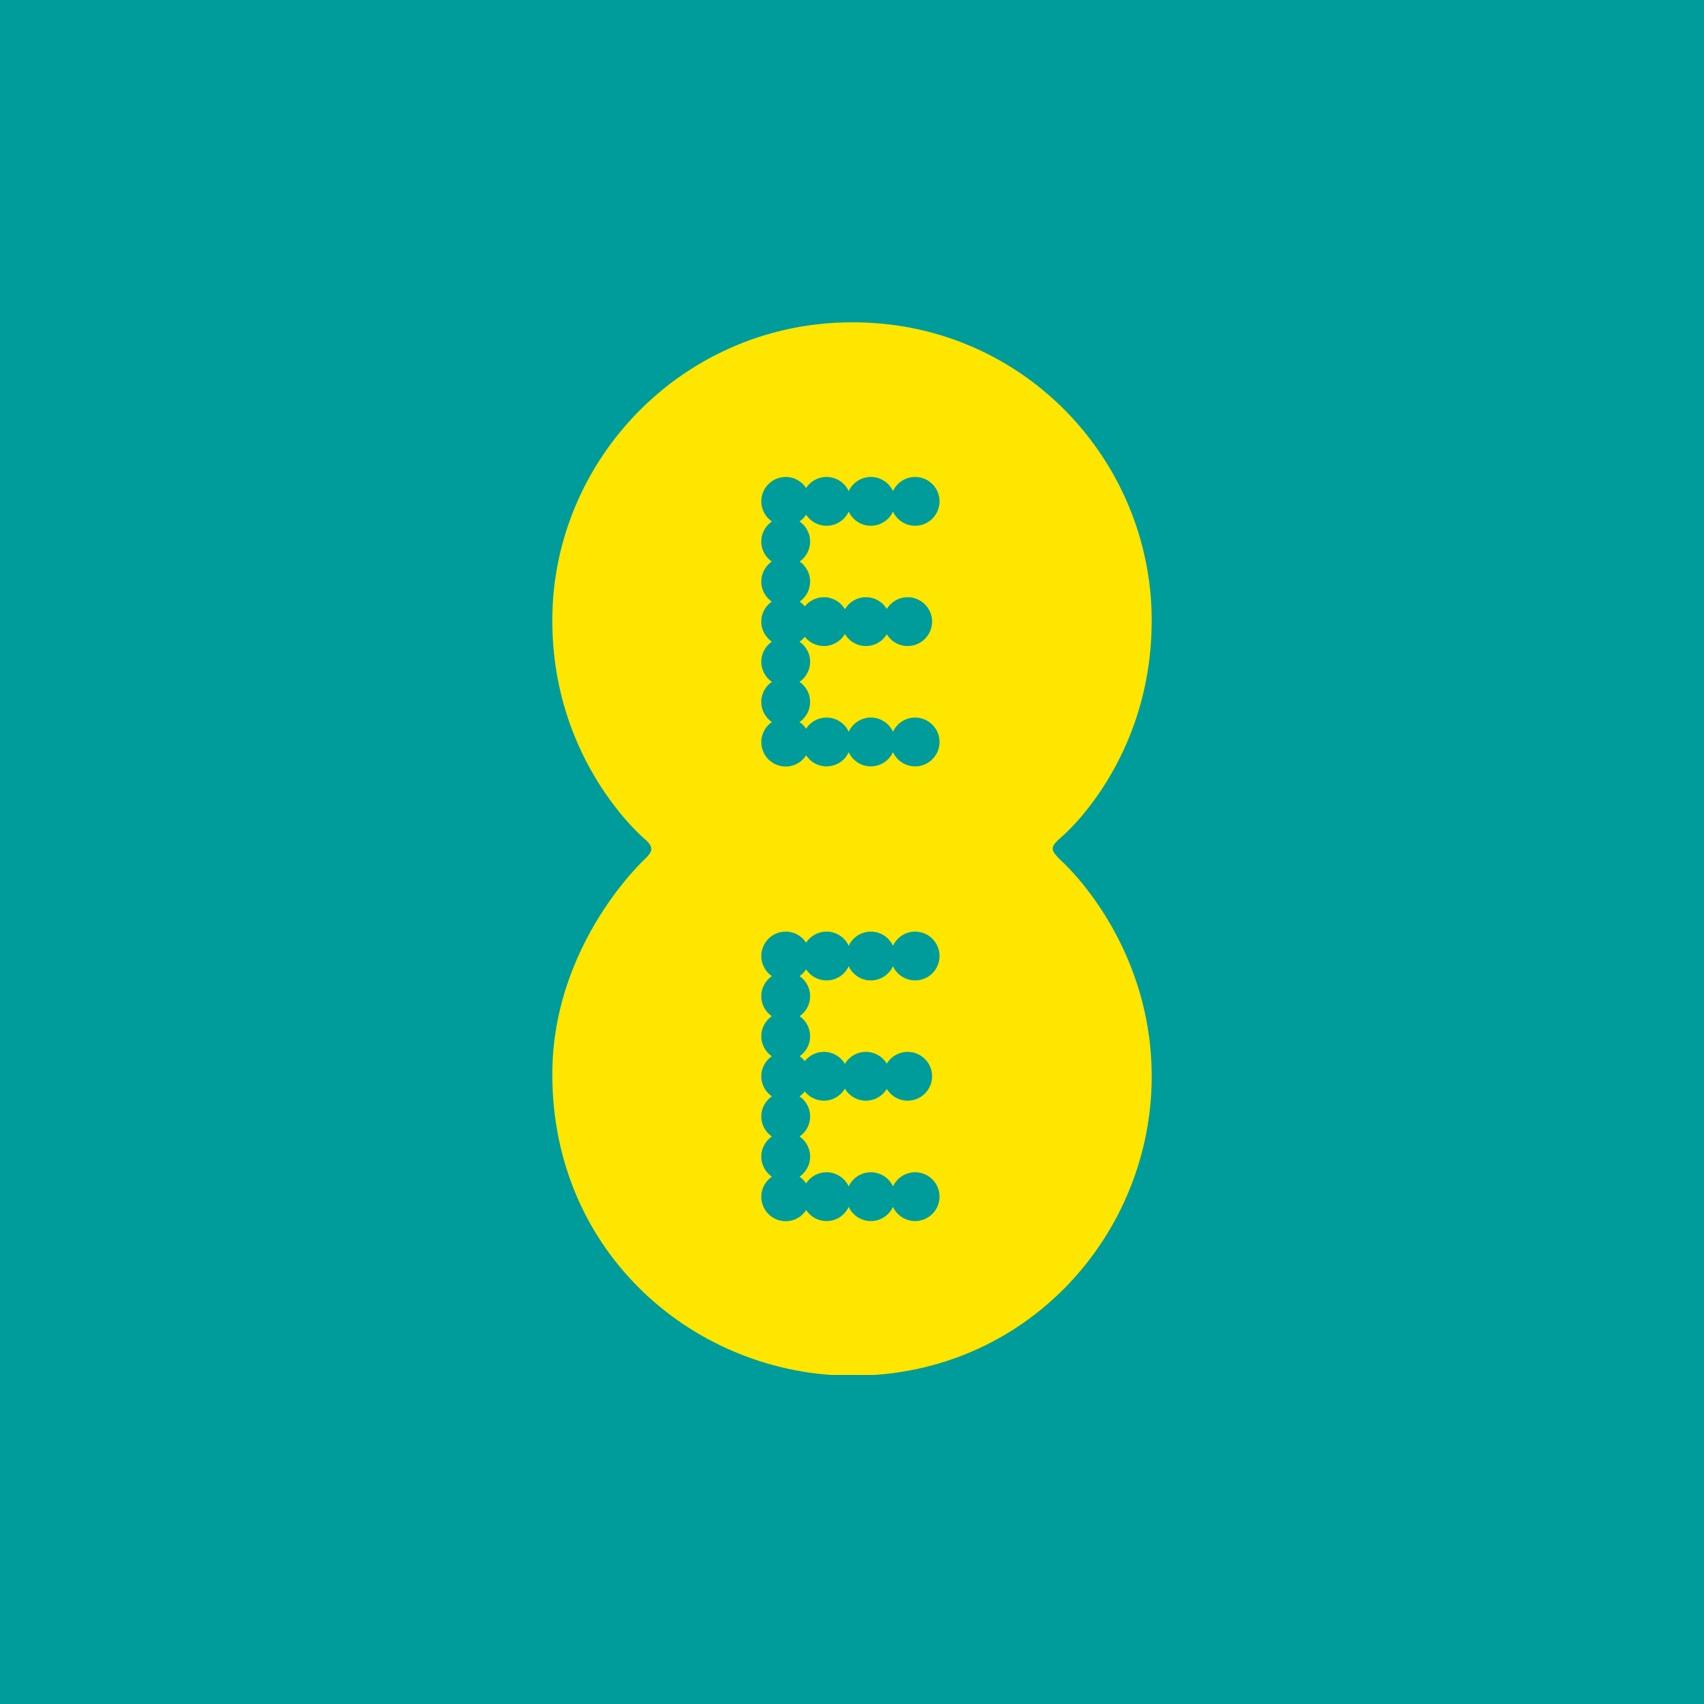 EE-logo-yellow.png